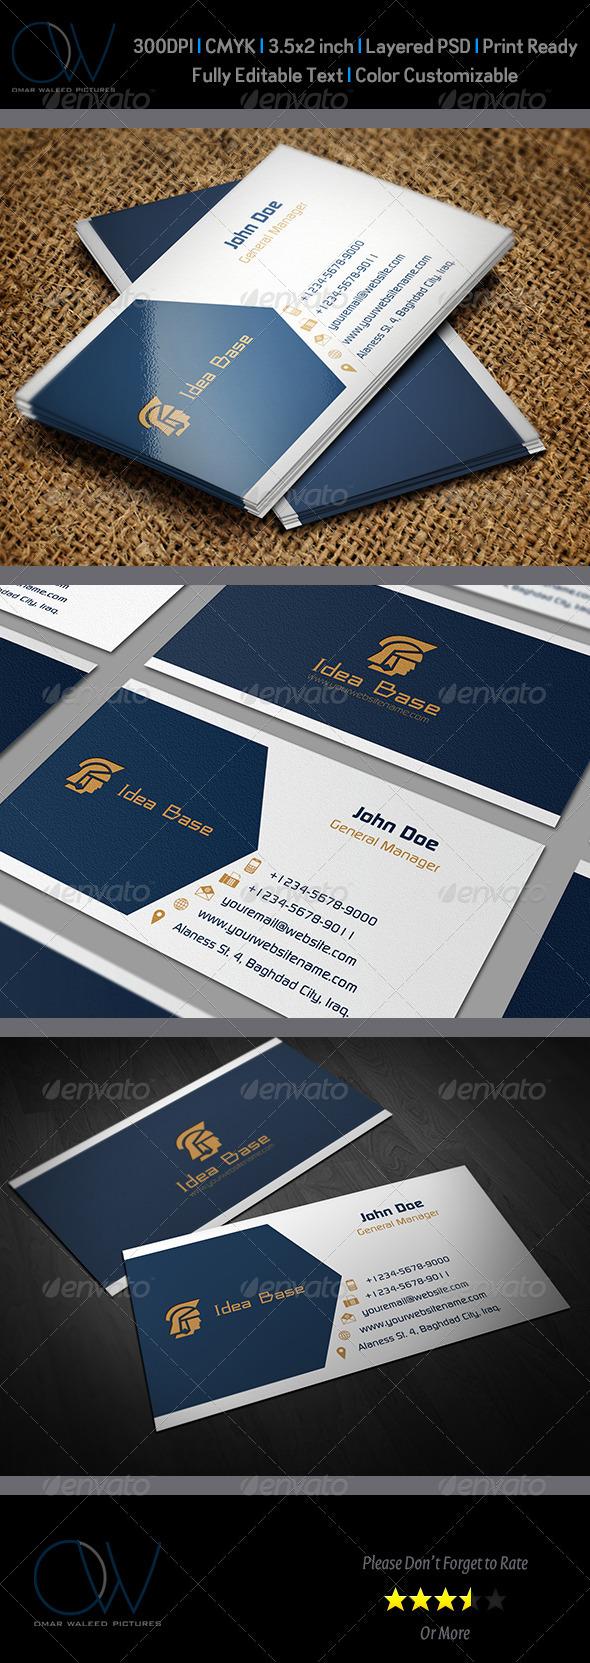 Idea Base Business Card - Corporate Business Cards